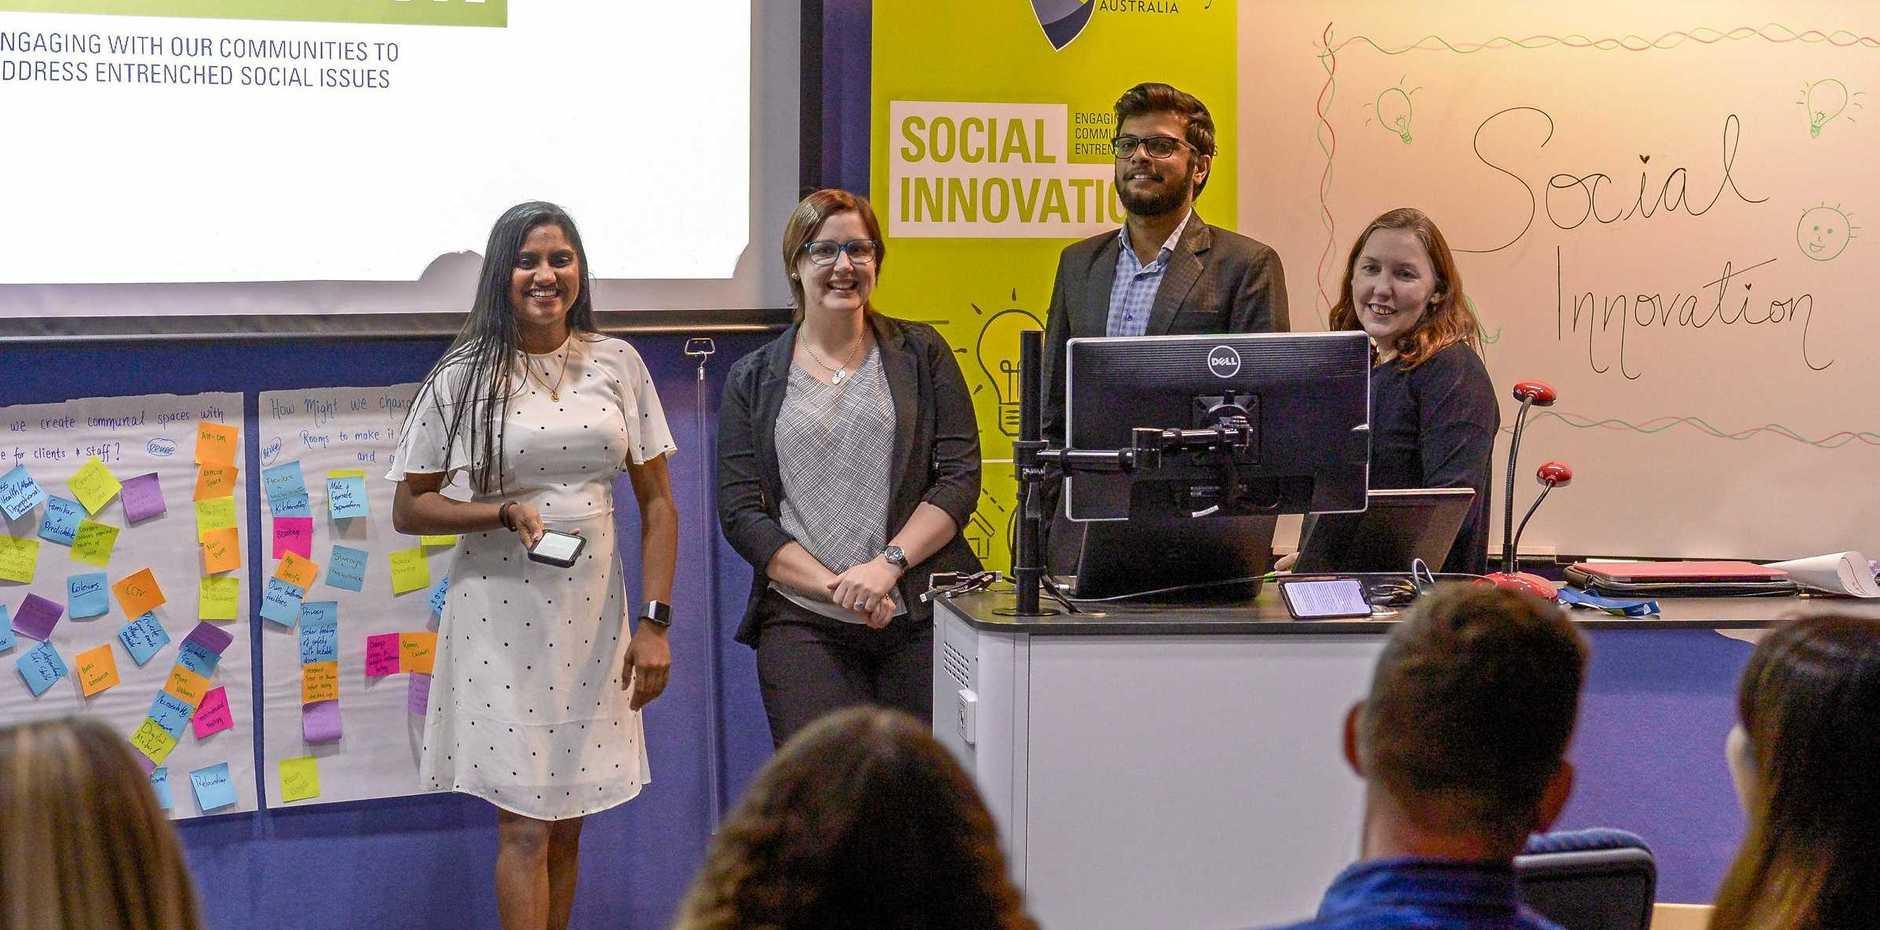 Dulmi Ranatunga, Renee Baker, Miten Kashiyani and Natalie Price giving their presentations as part of the CQUniversity Gladstone social innovation workshop.